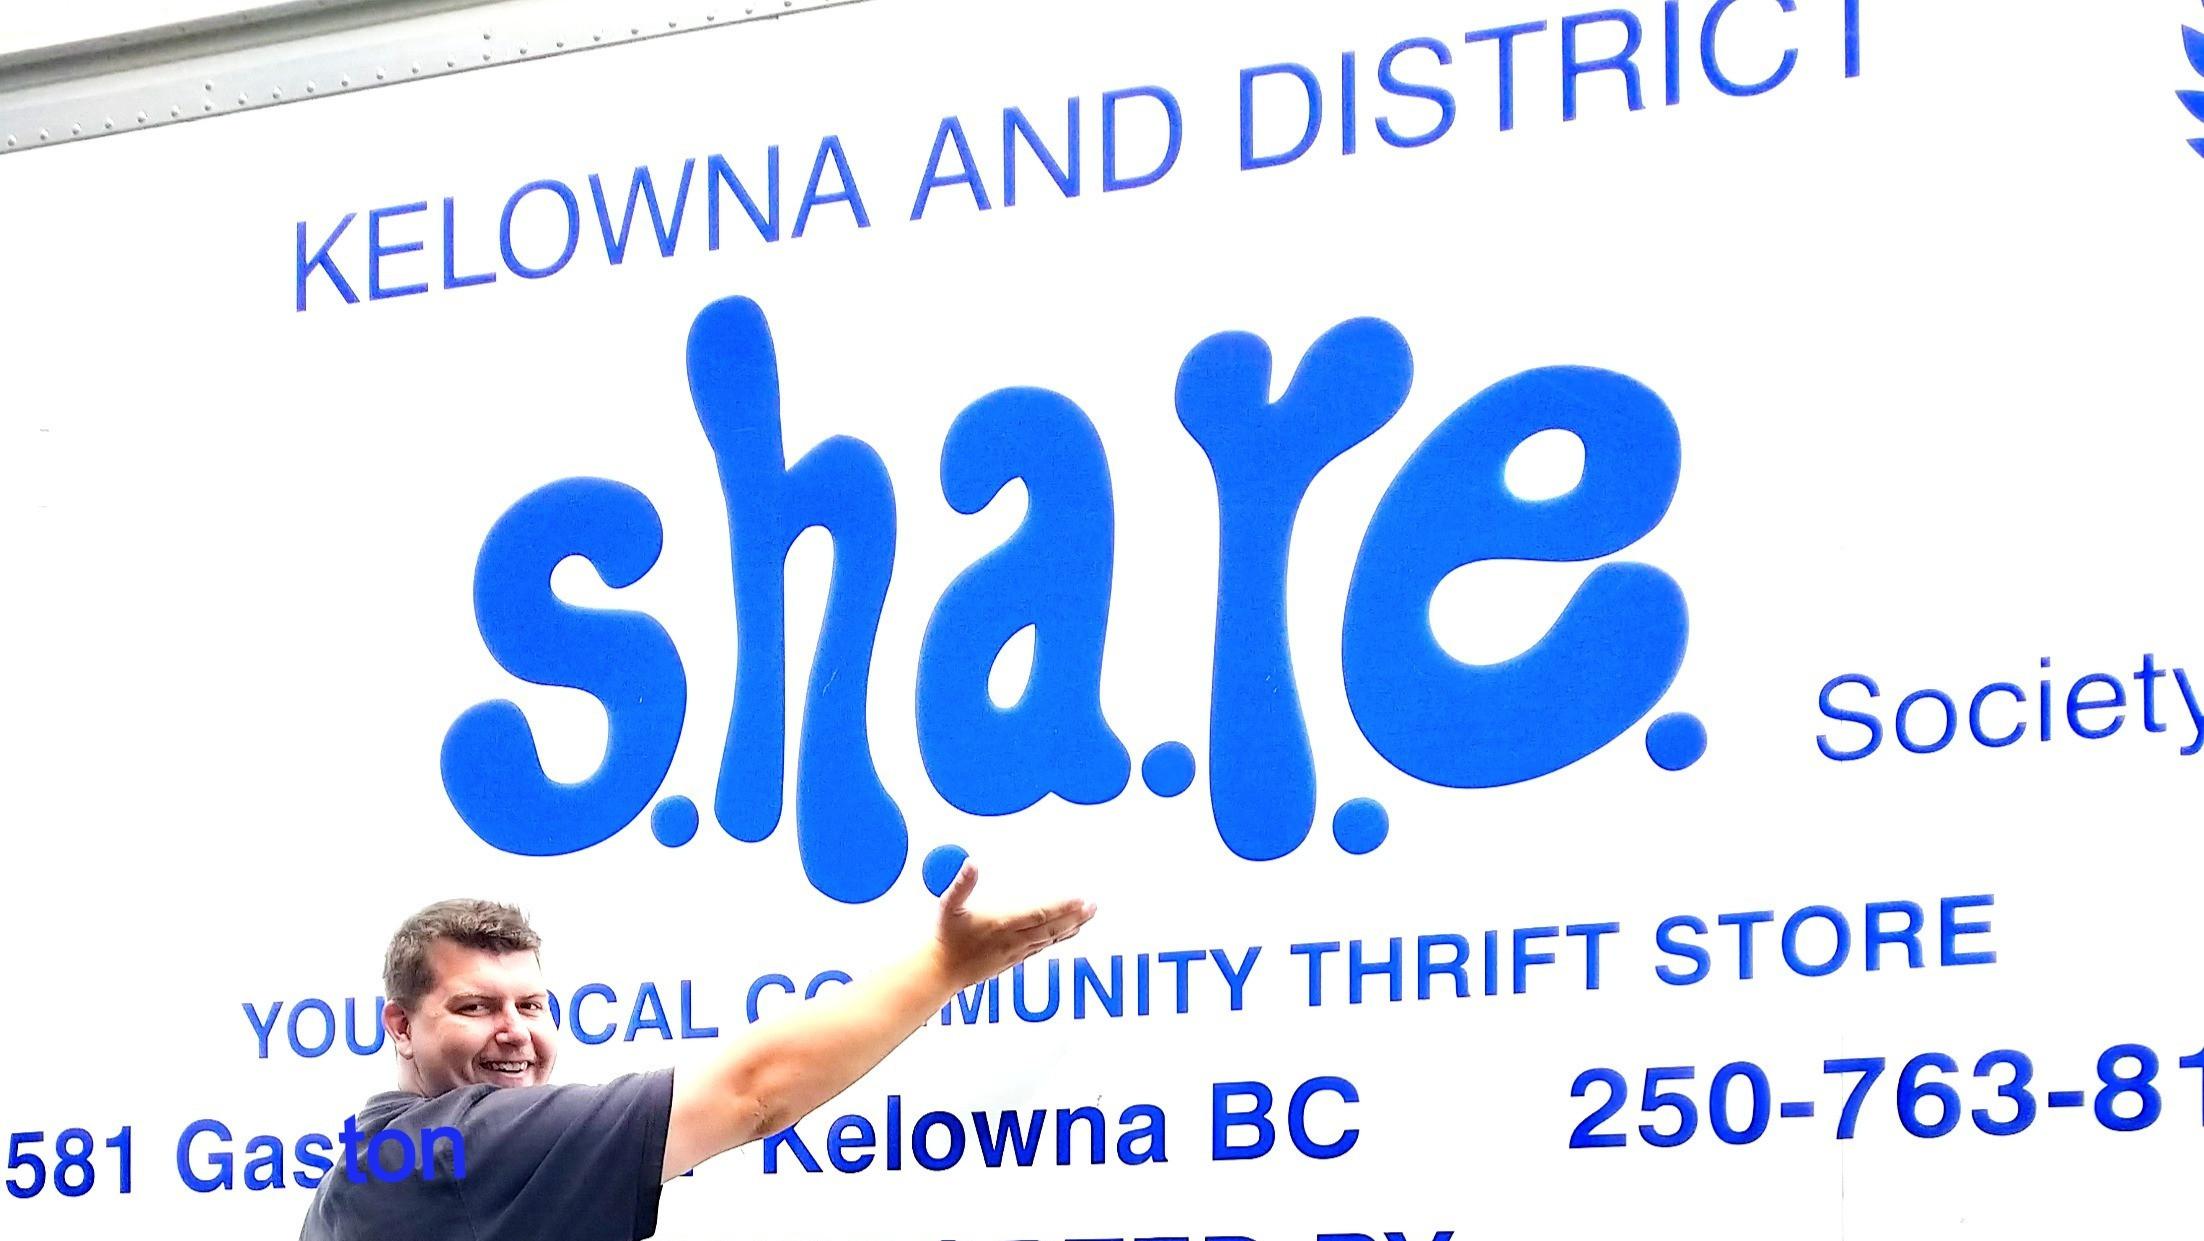 Share Thrift Store logo